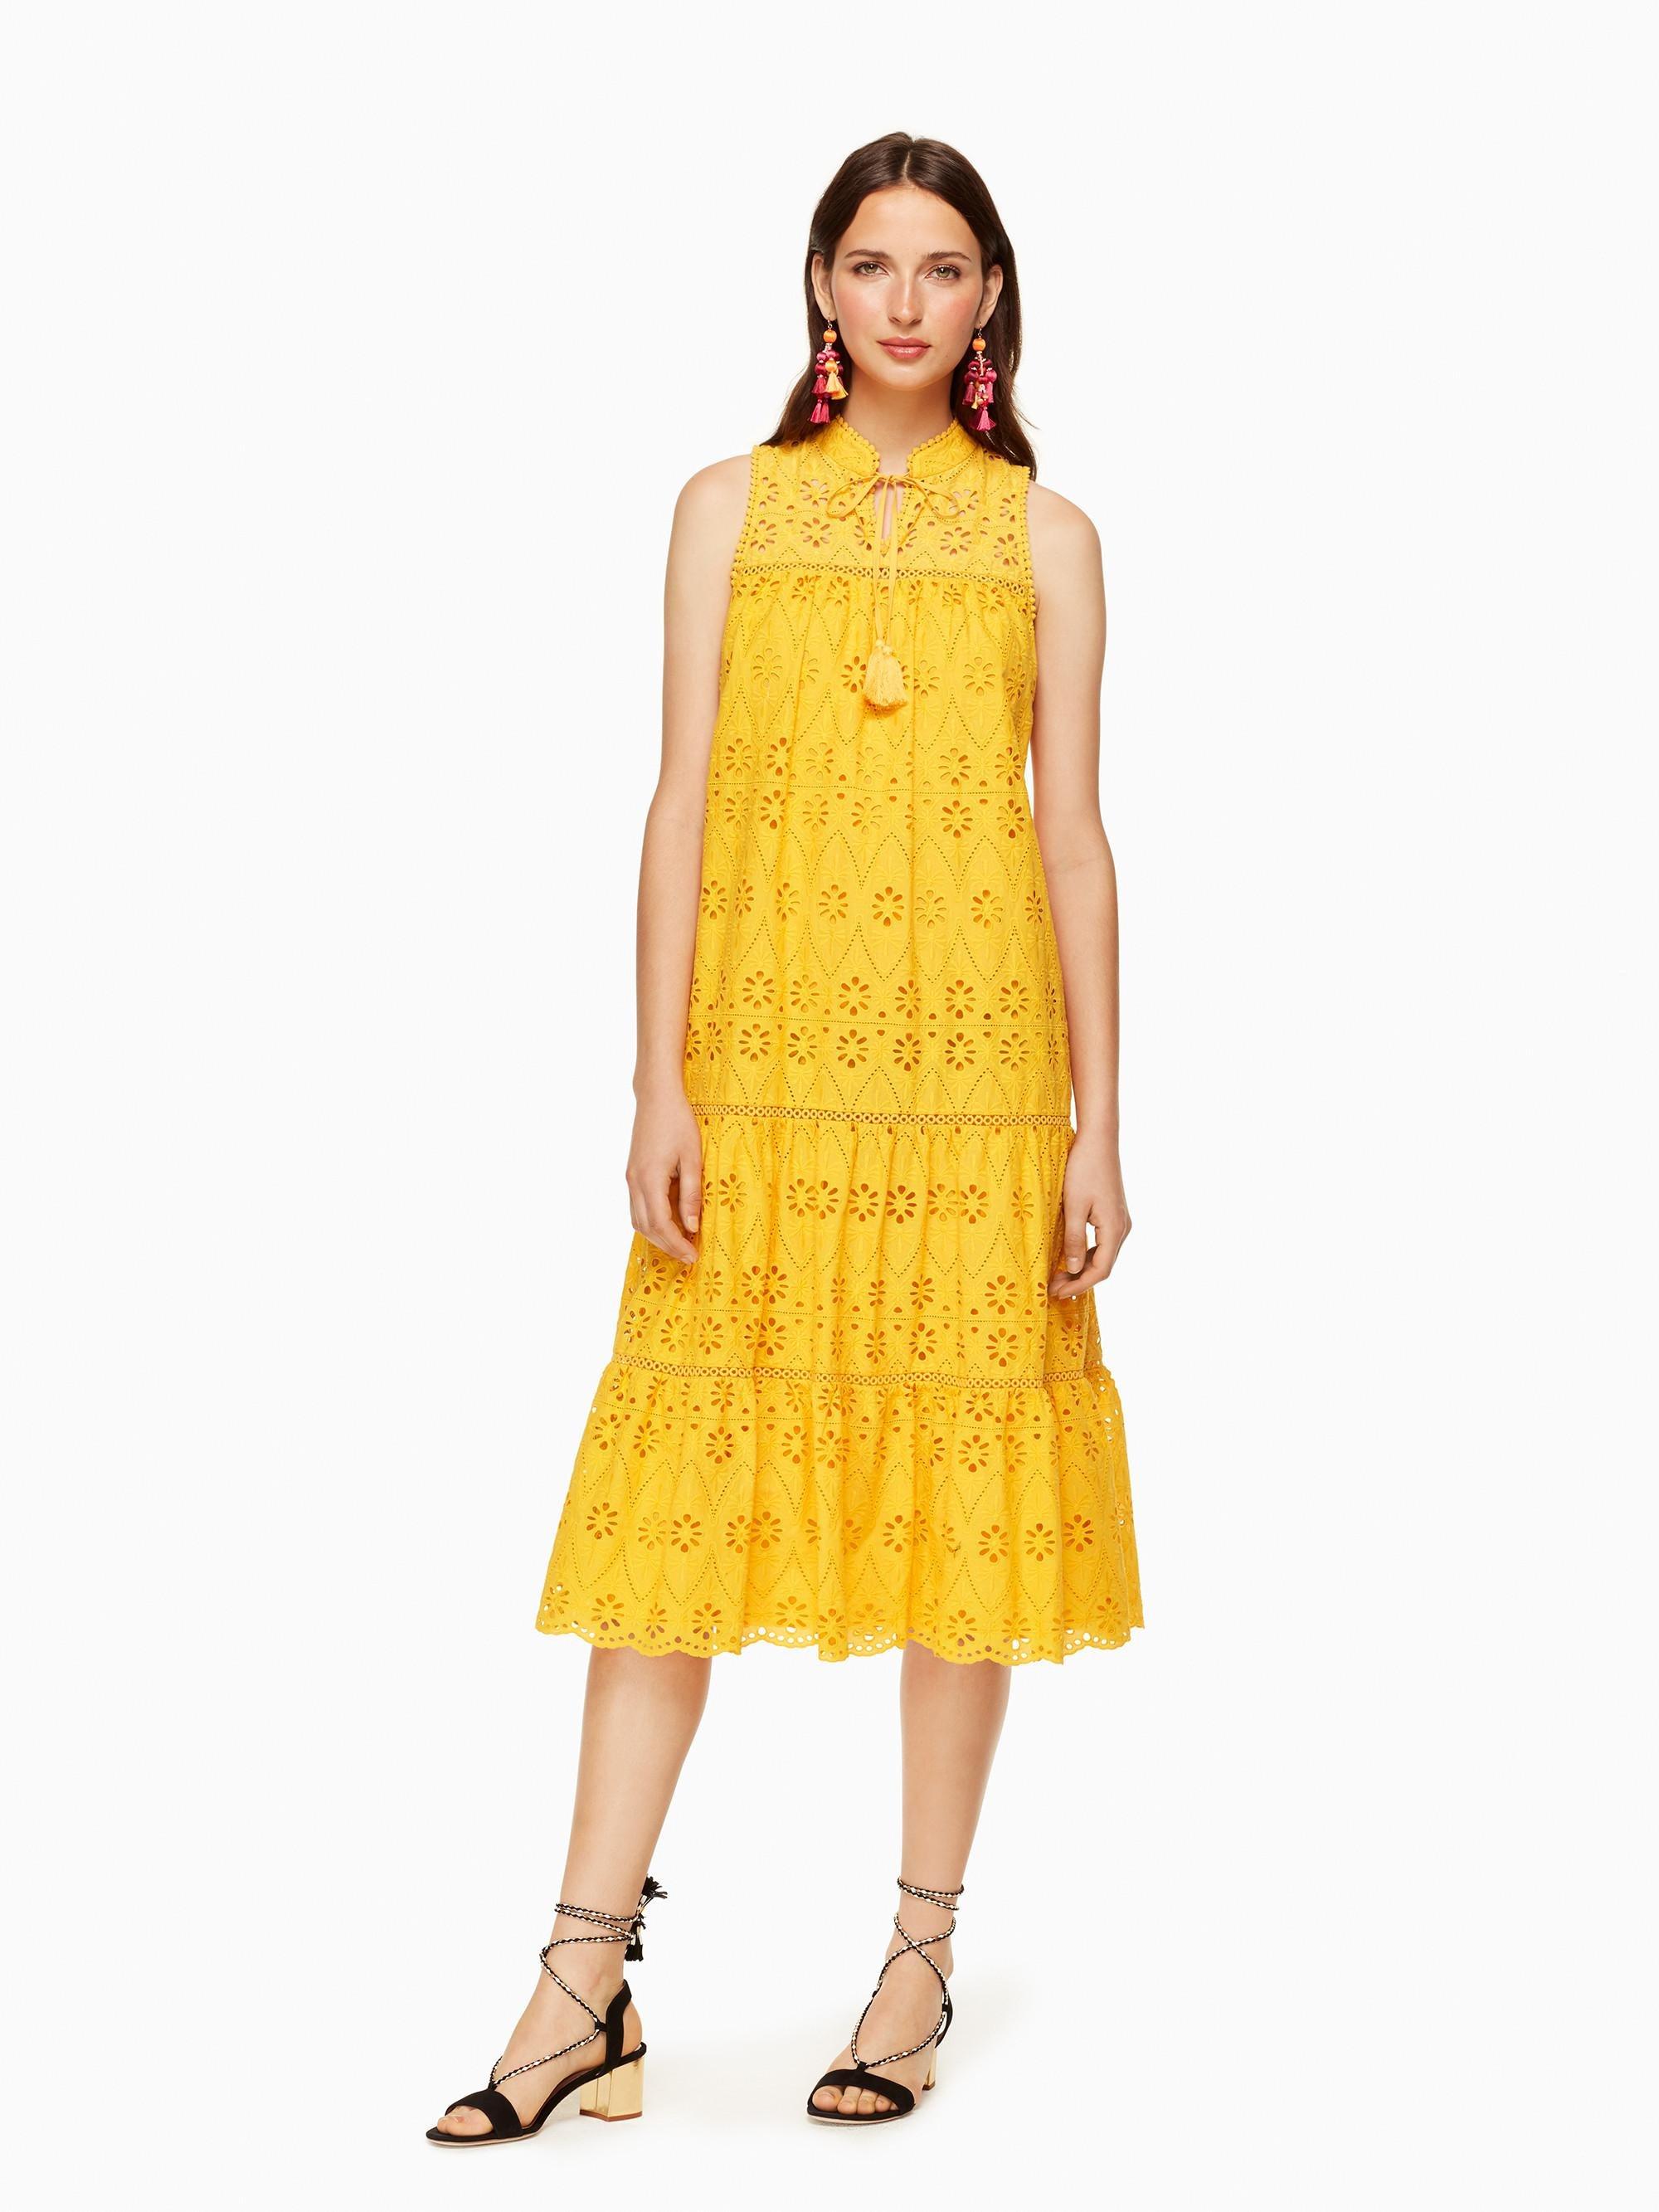 Lyst Kate spade Eyelet Patio Dress in Yellow